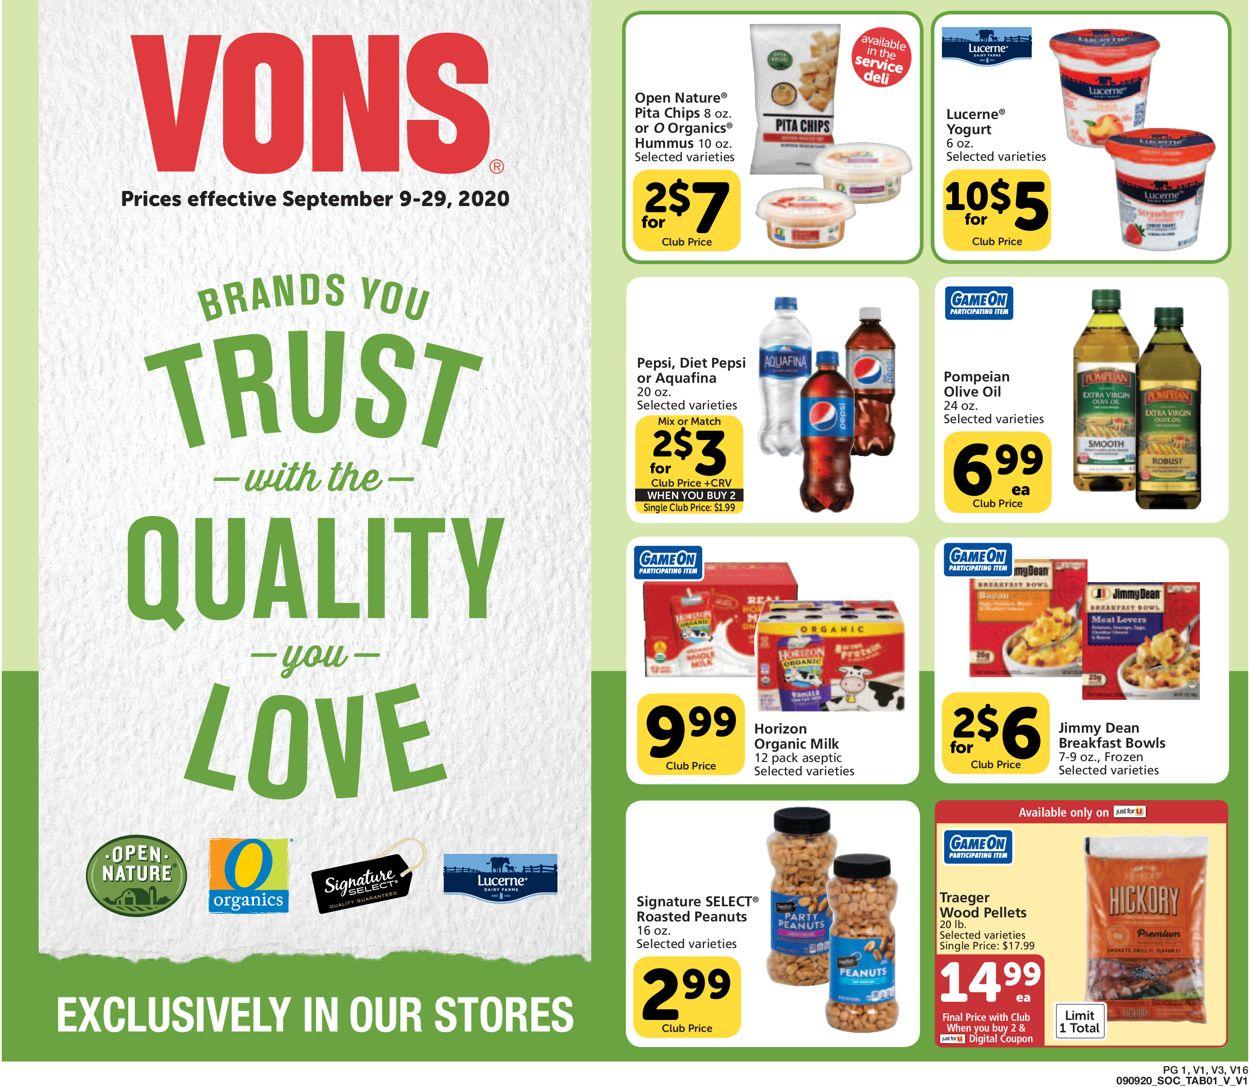 Vons Weekly Ad Circular - valid 09/09-09/29/2020